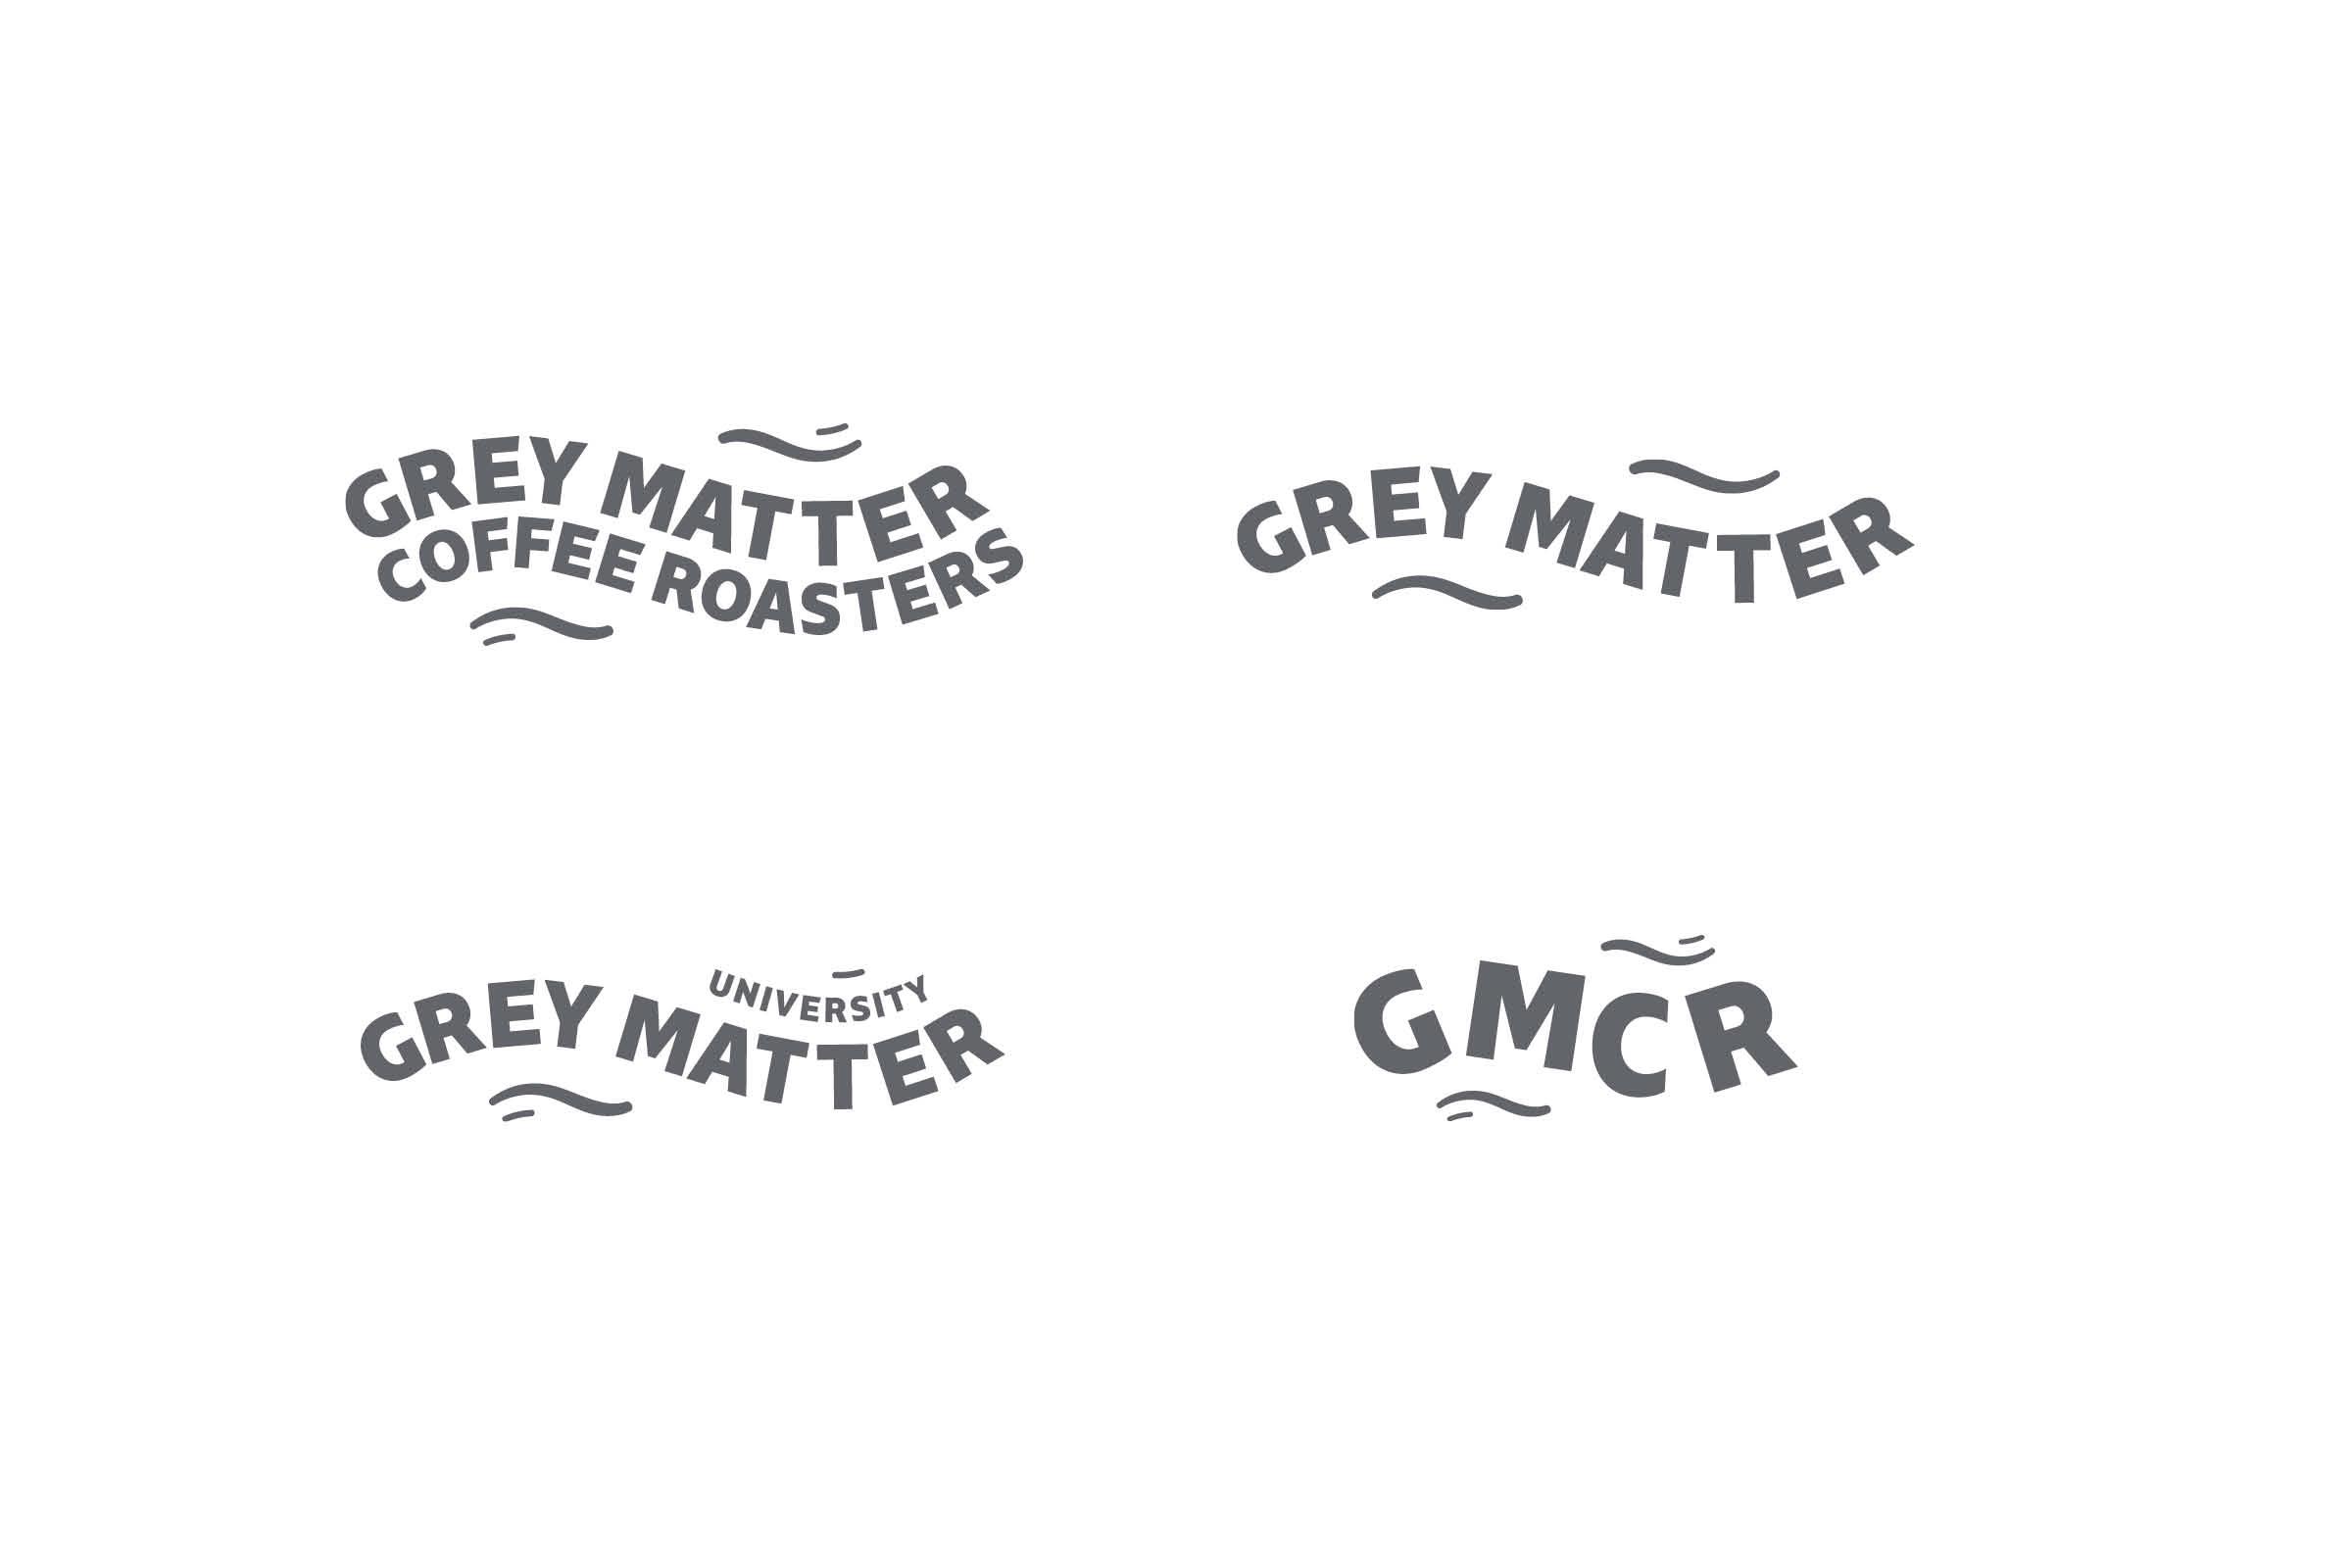 branding logos designed for Grey Matter Coffee Roasters